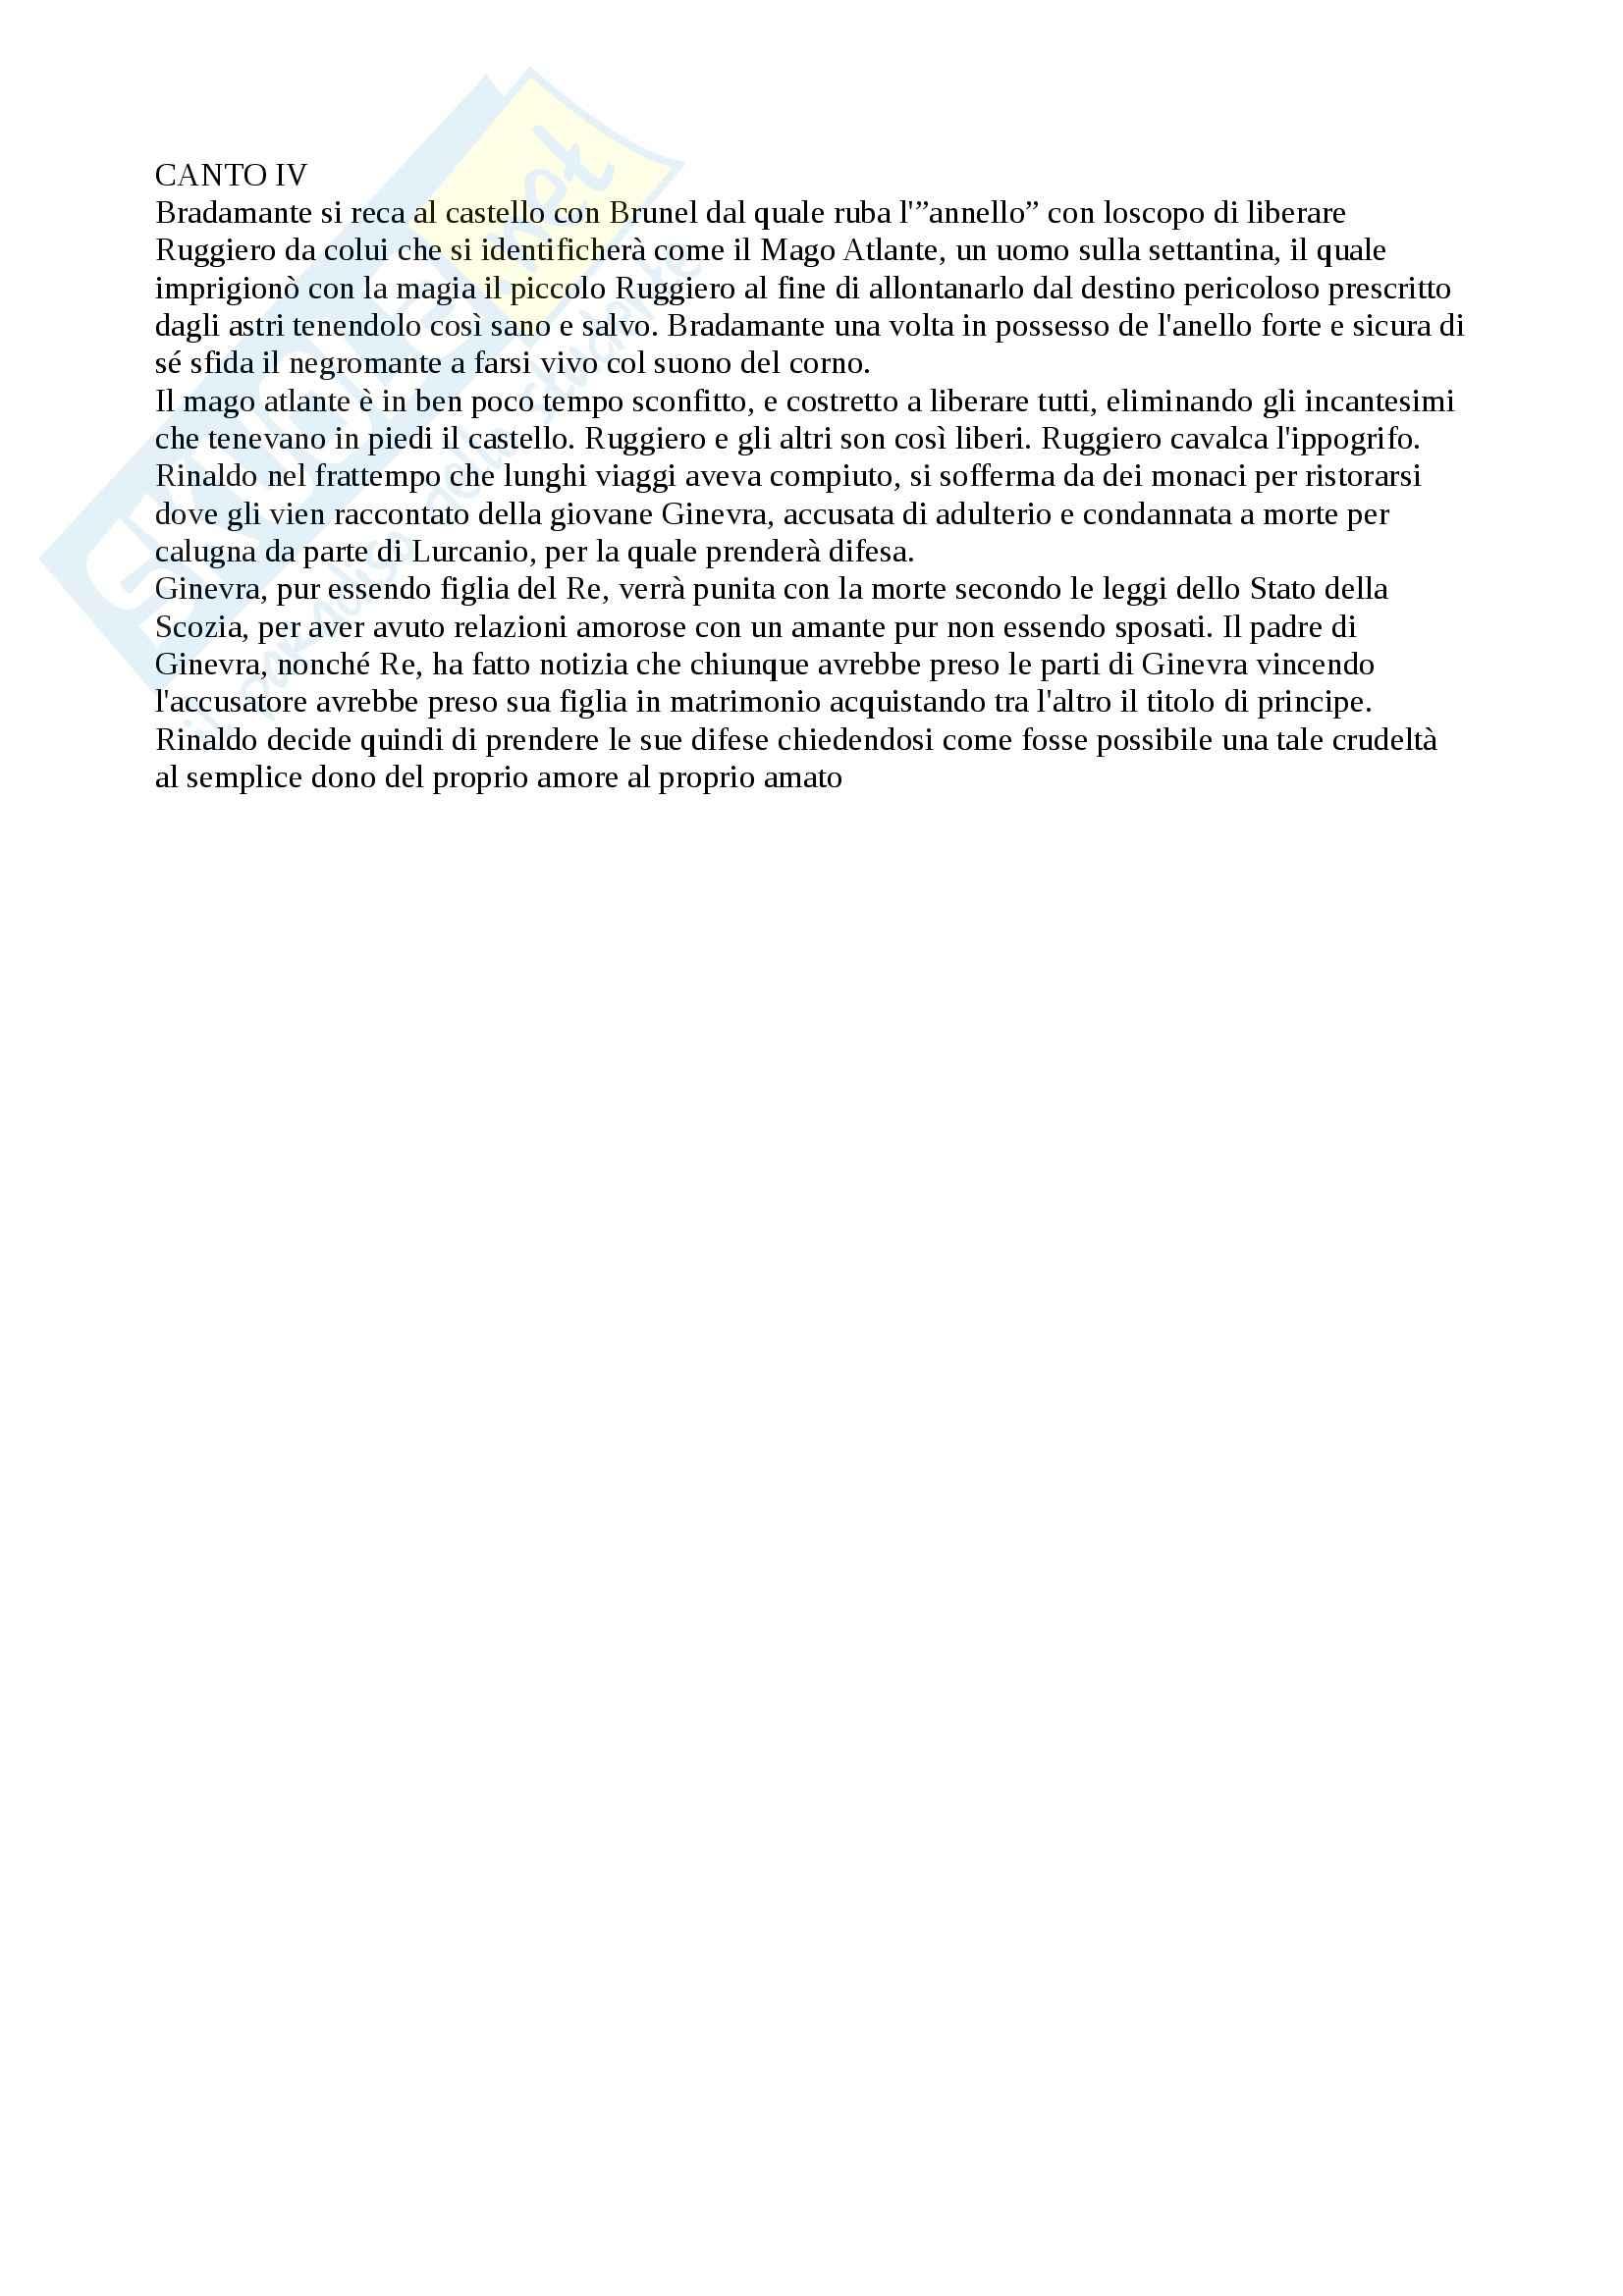 Orlando furioso, Ariosto - Riassunto Canto IV, prof. Sarnelli